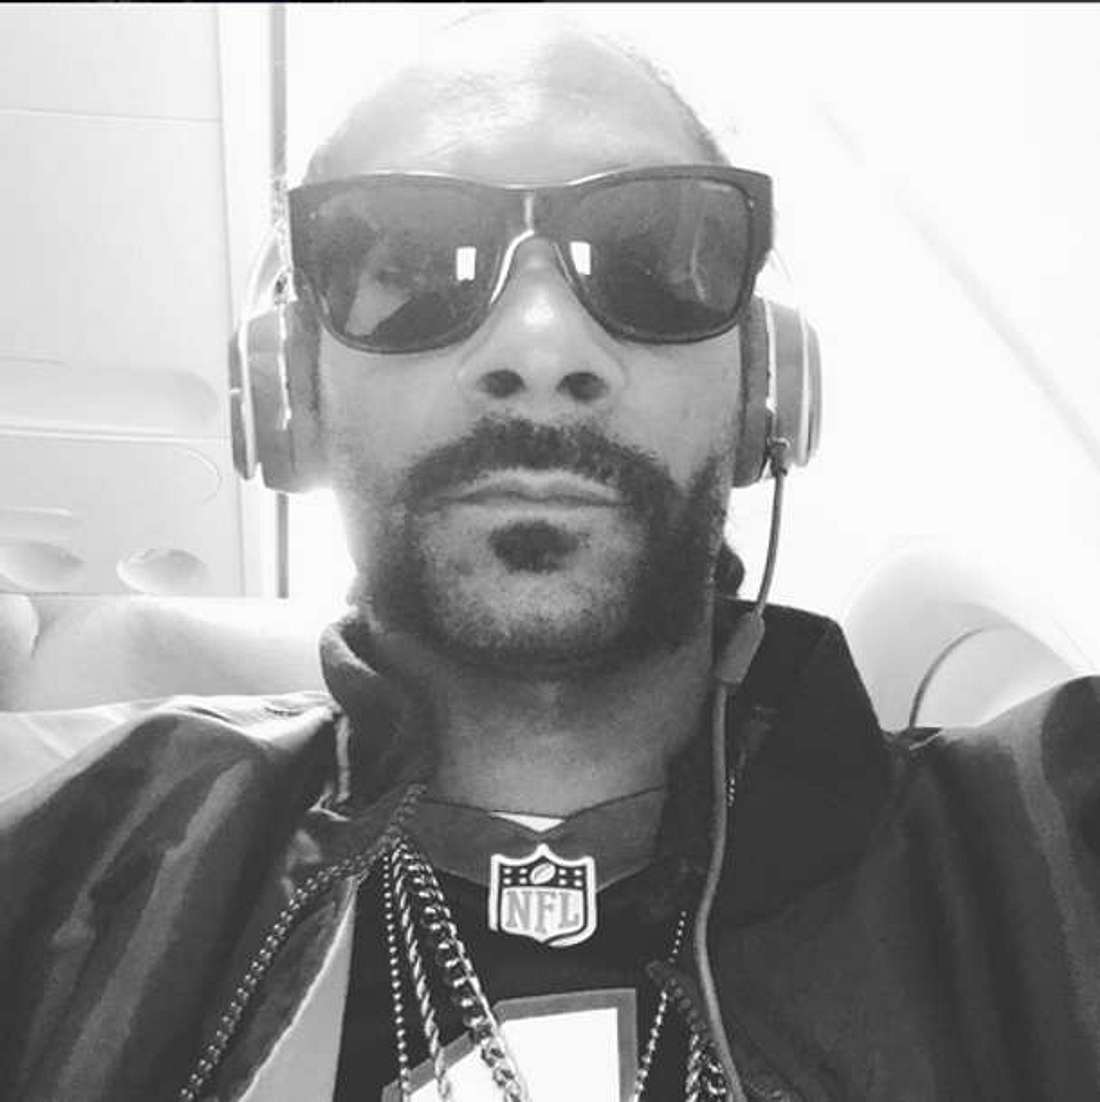 Snoop Dogg Arnold Schwarzenegger Rassist